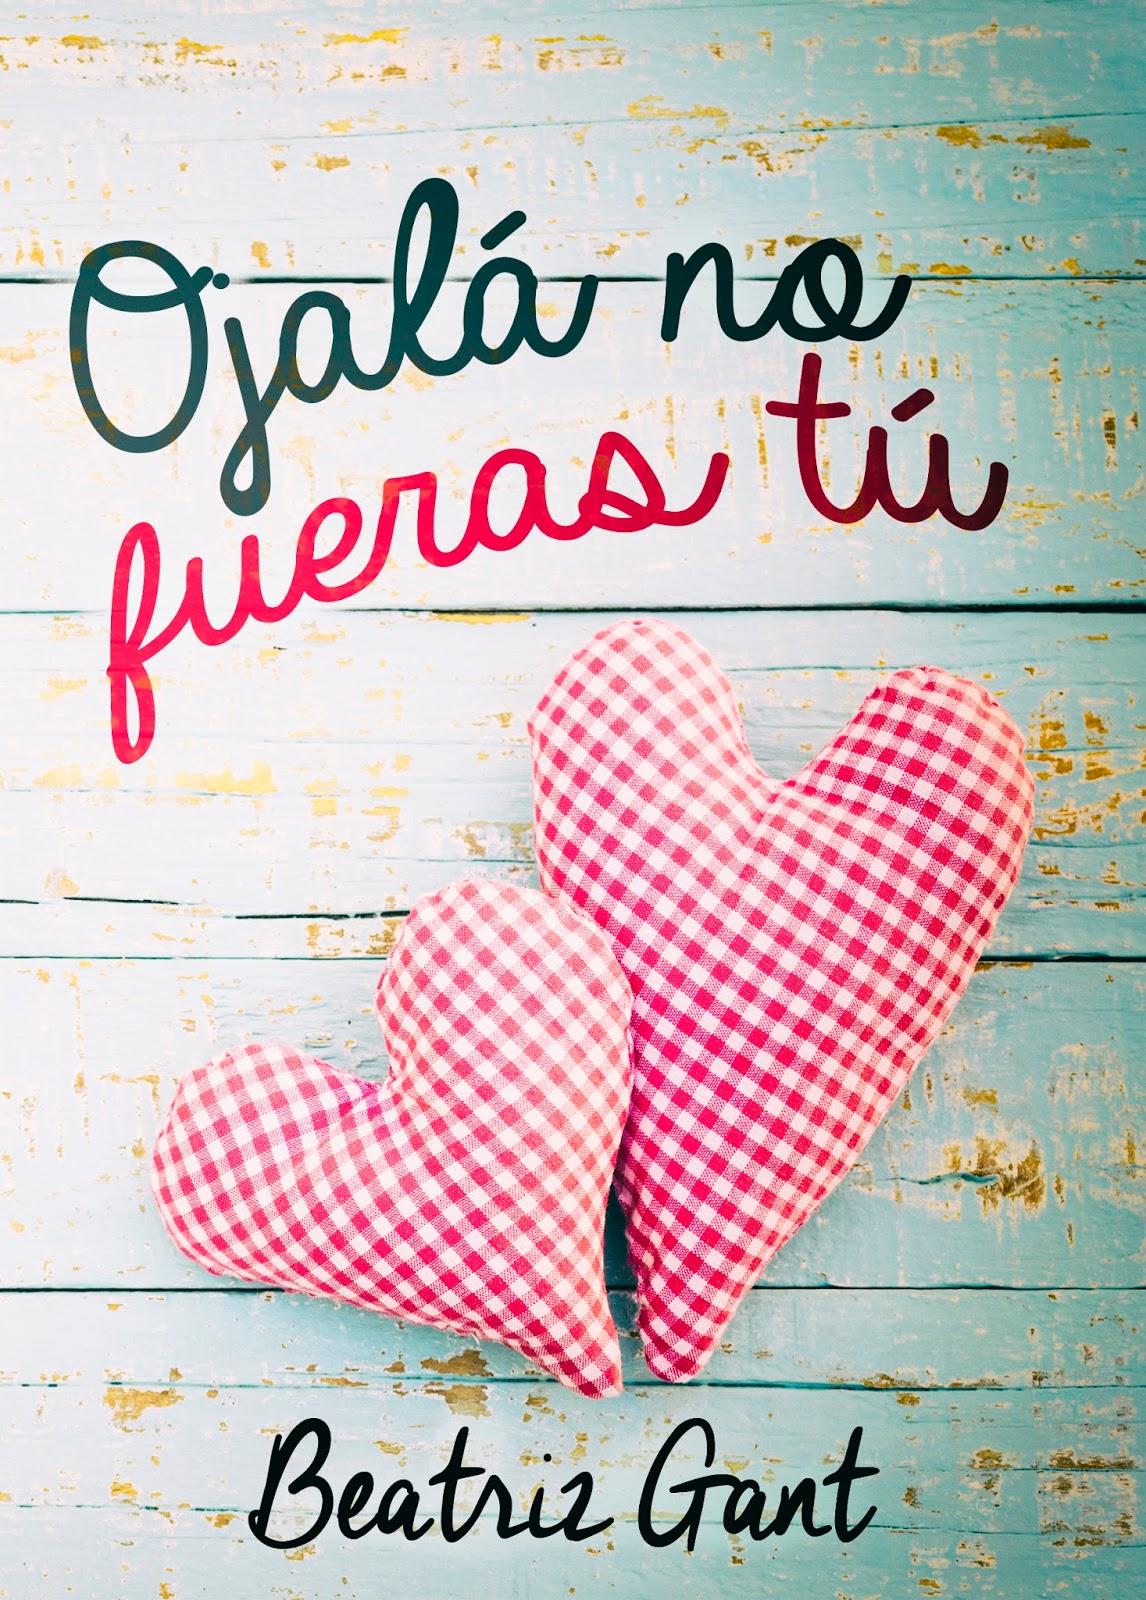 http://labibliotecadebella.blogspot.com.es/2016/02/ojala-no-fueras-tu-beatriz-gantz.html